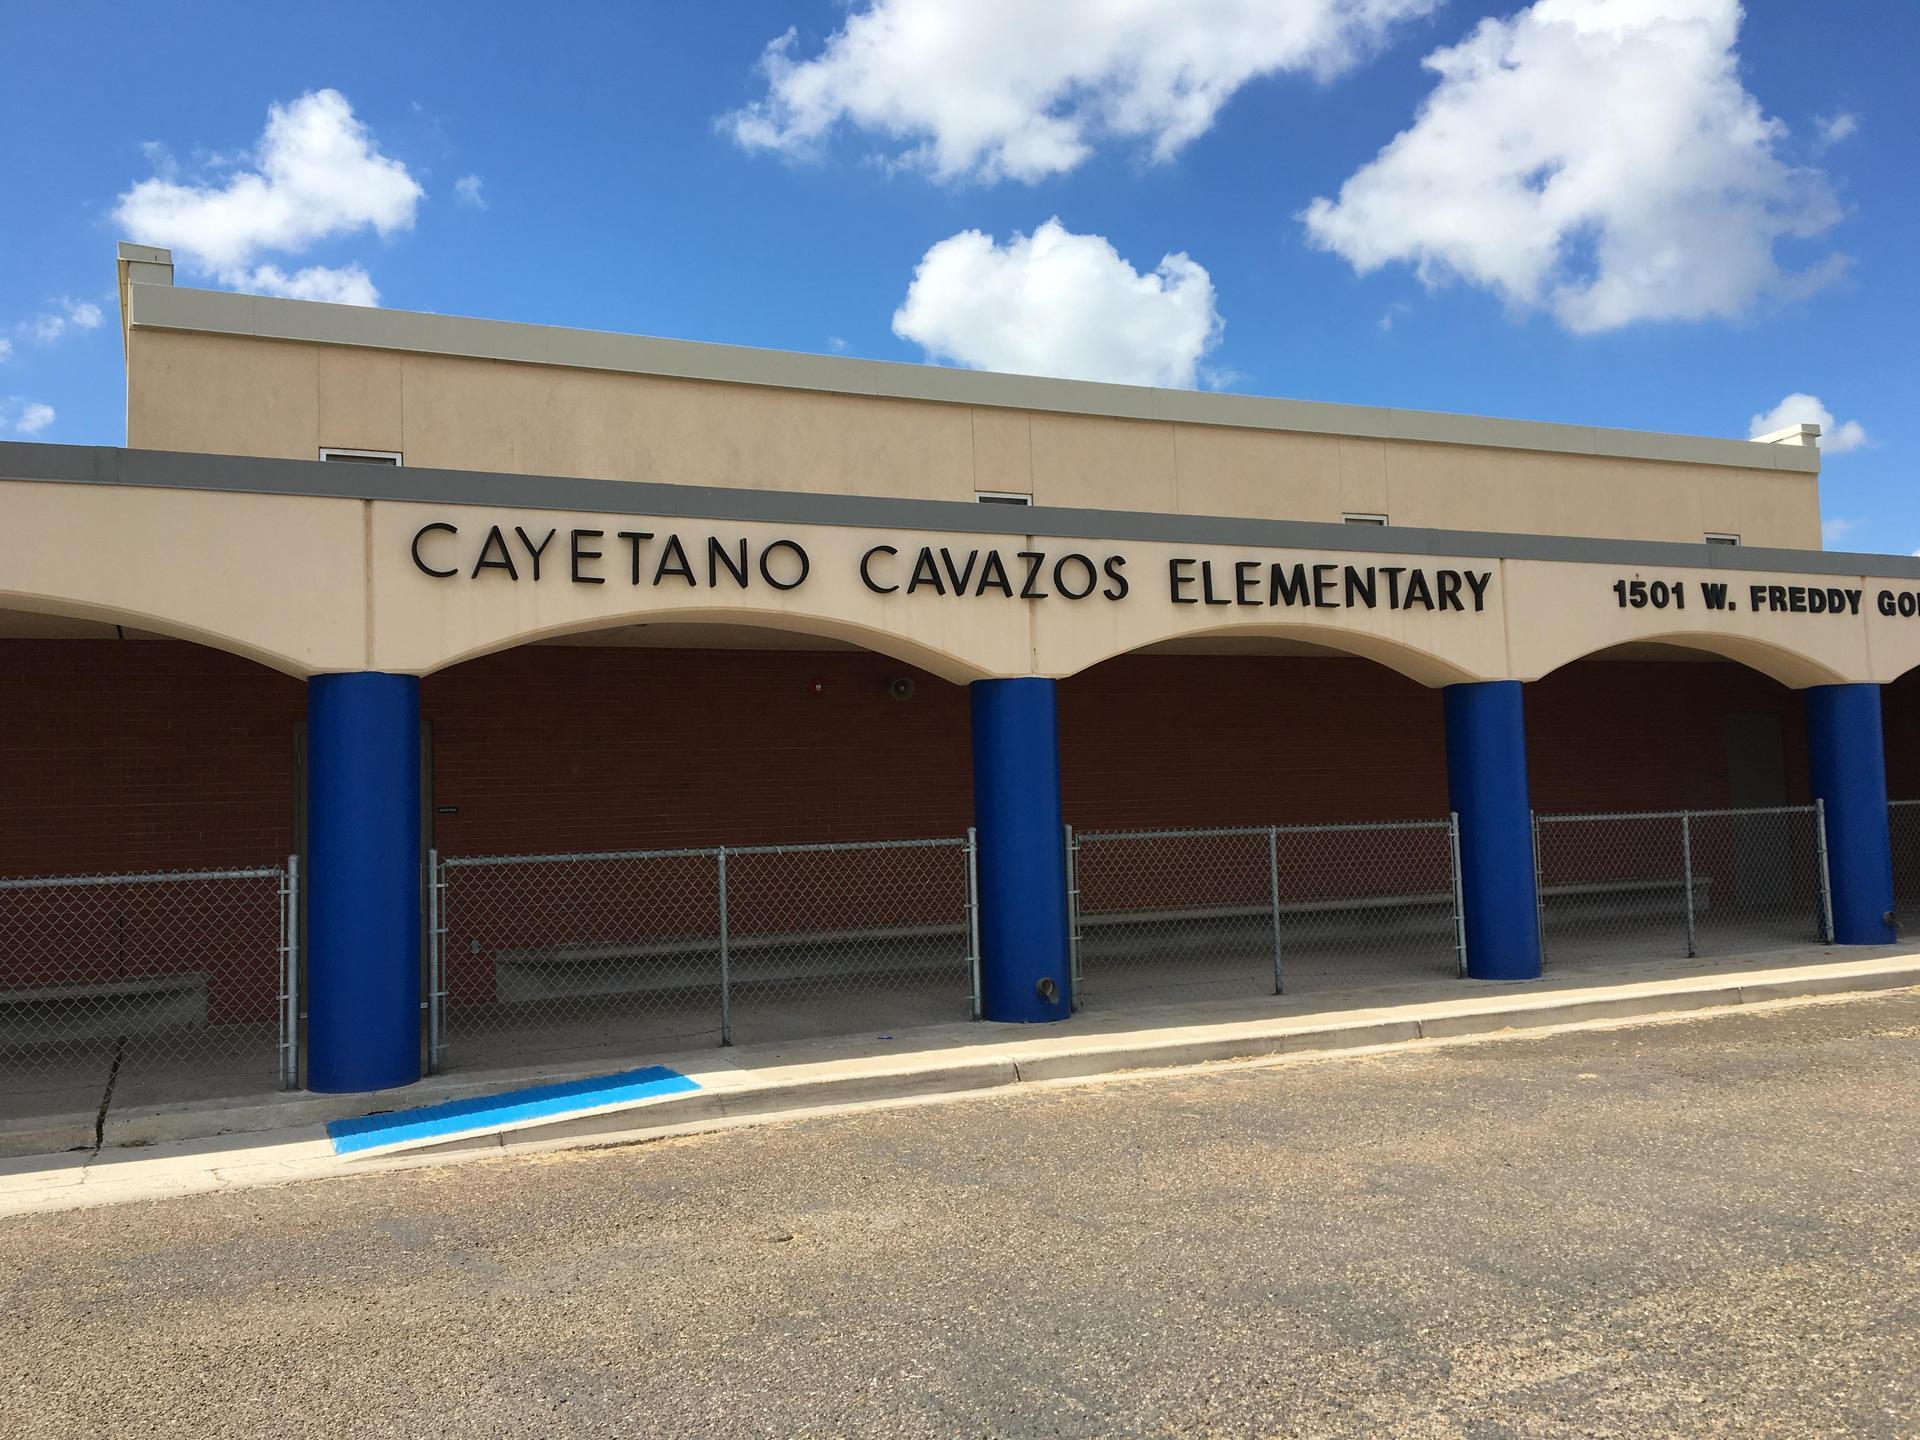 Cavazos Elementary